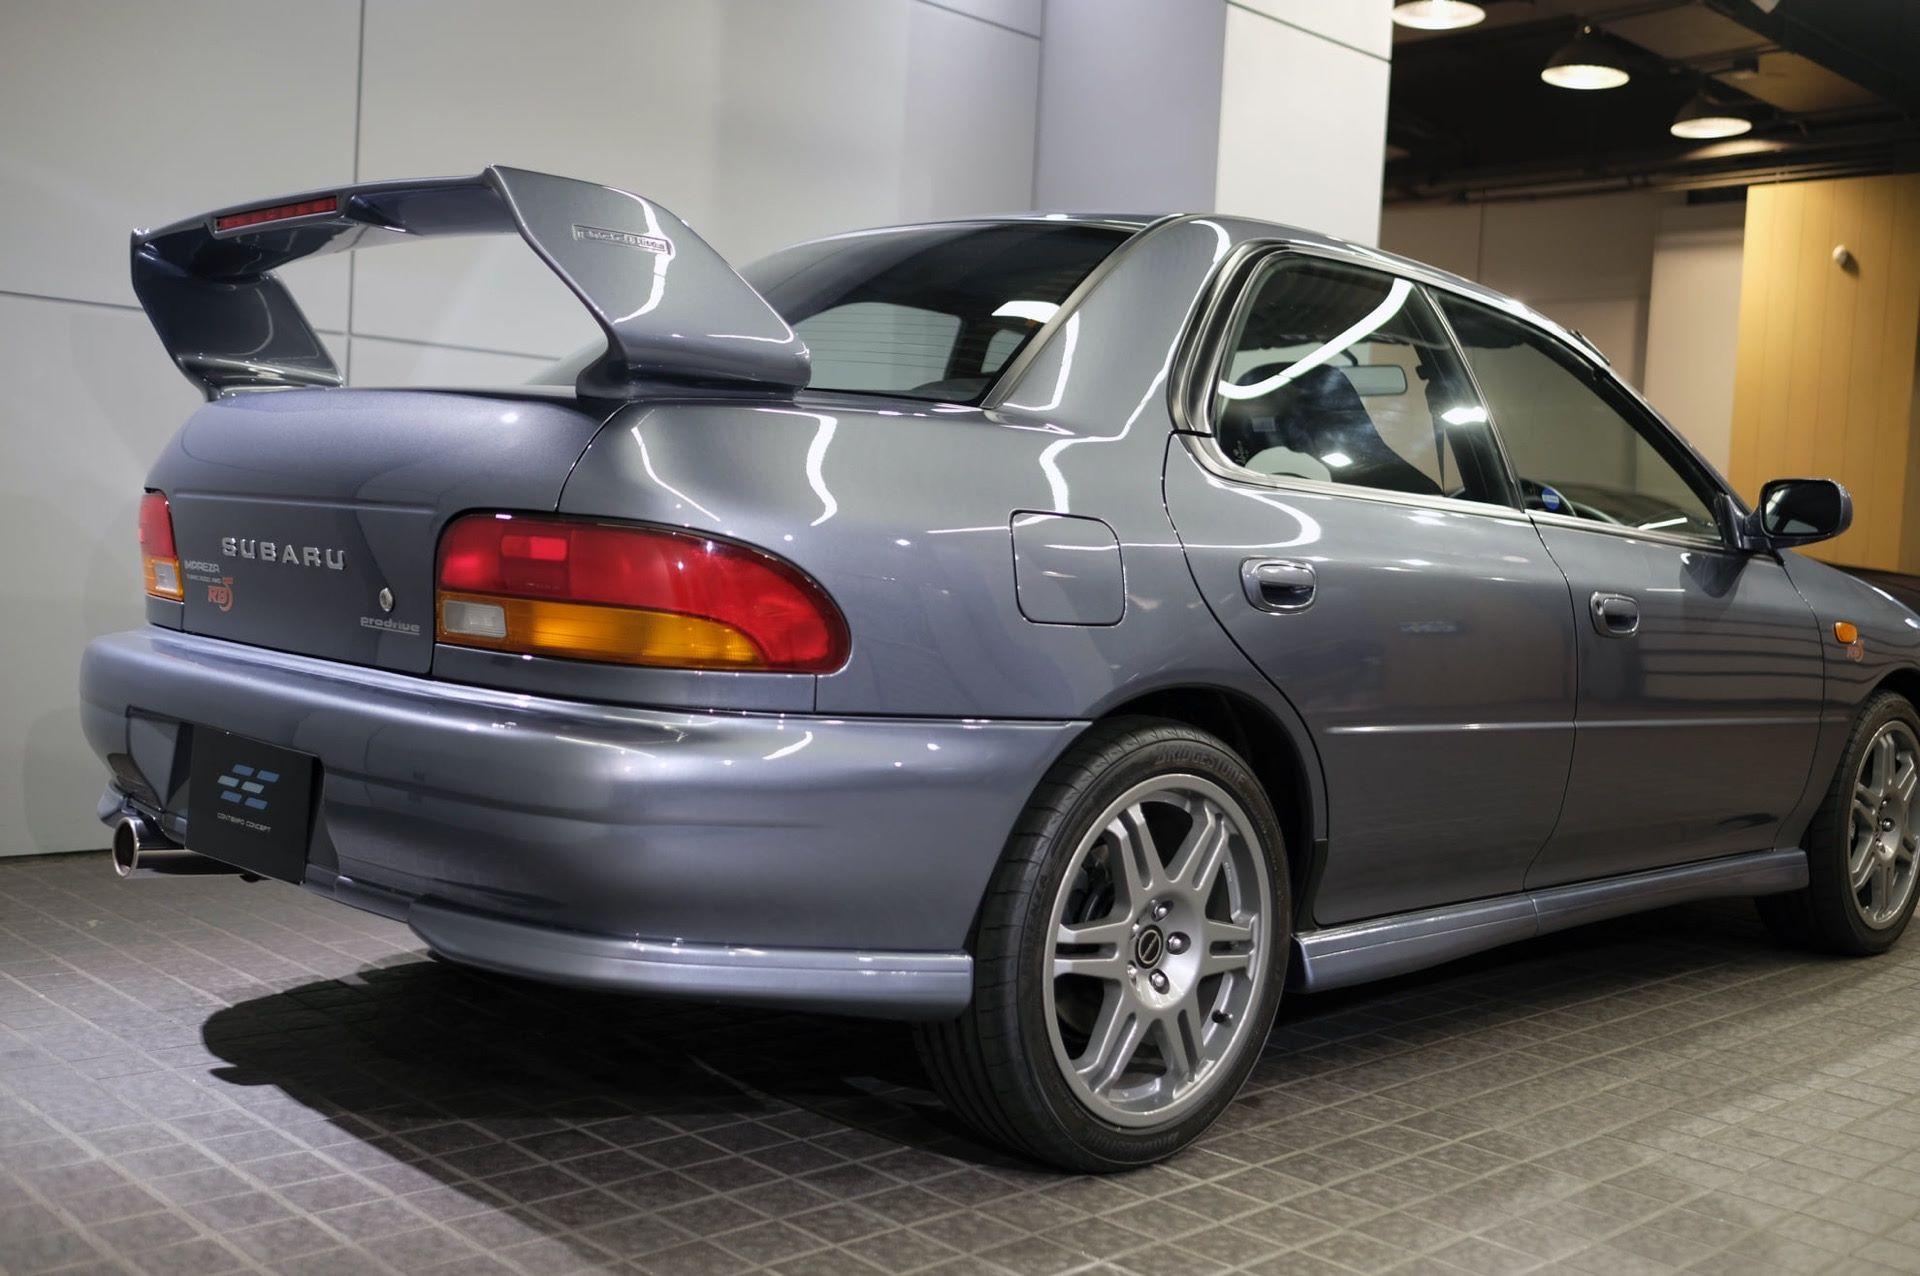 Subaru-Impreza-RB5-1999-2